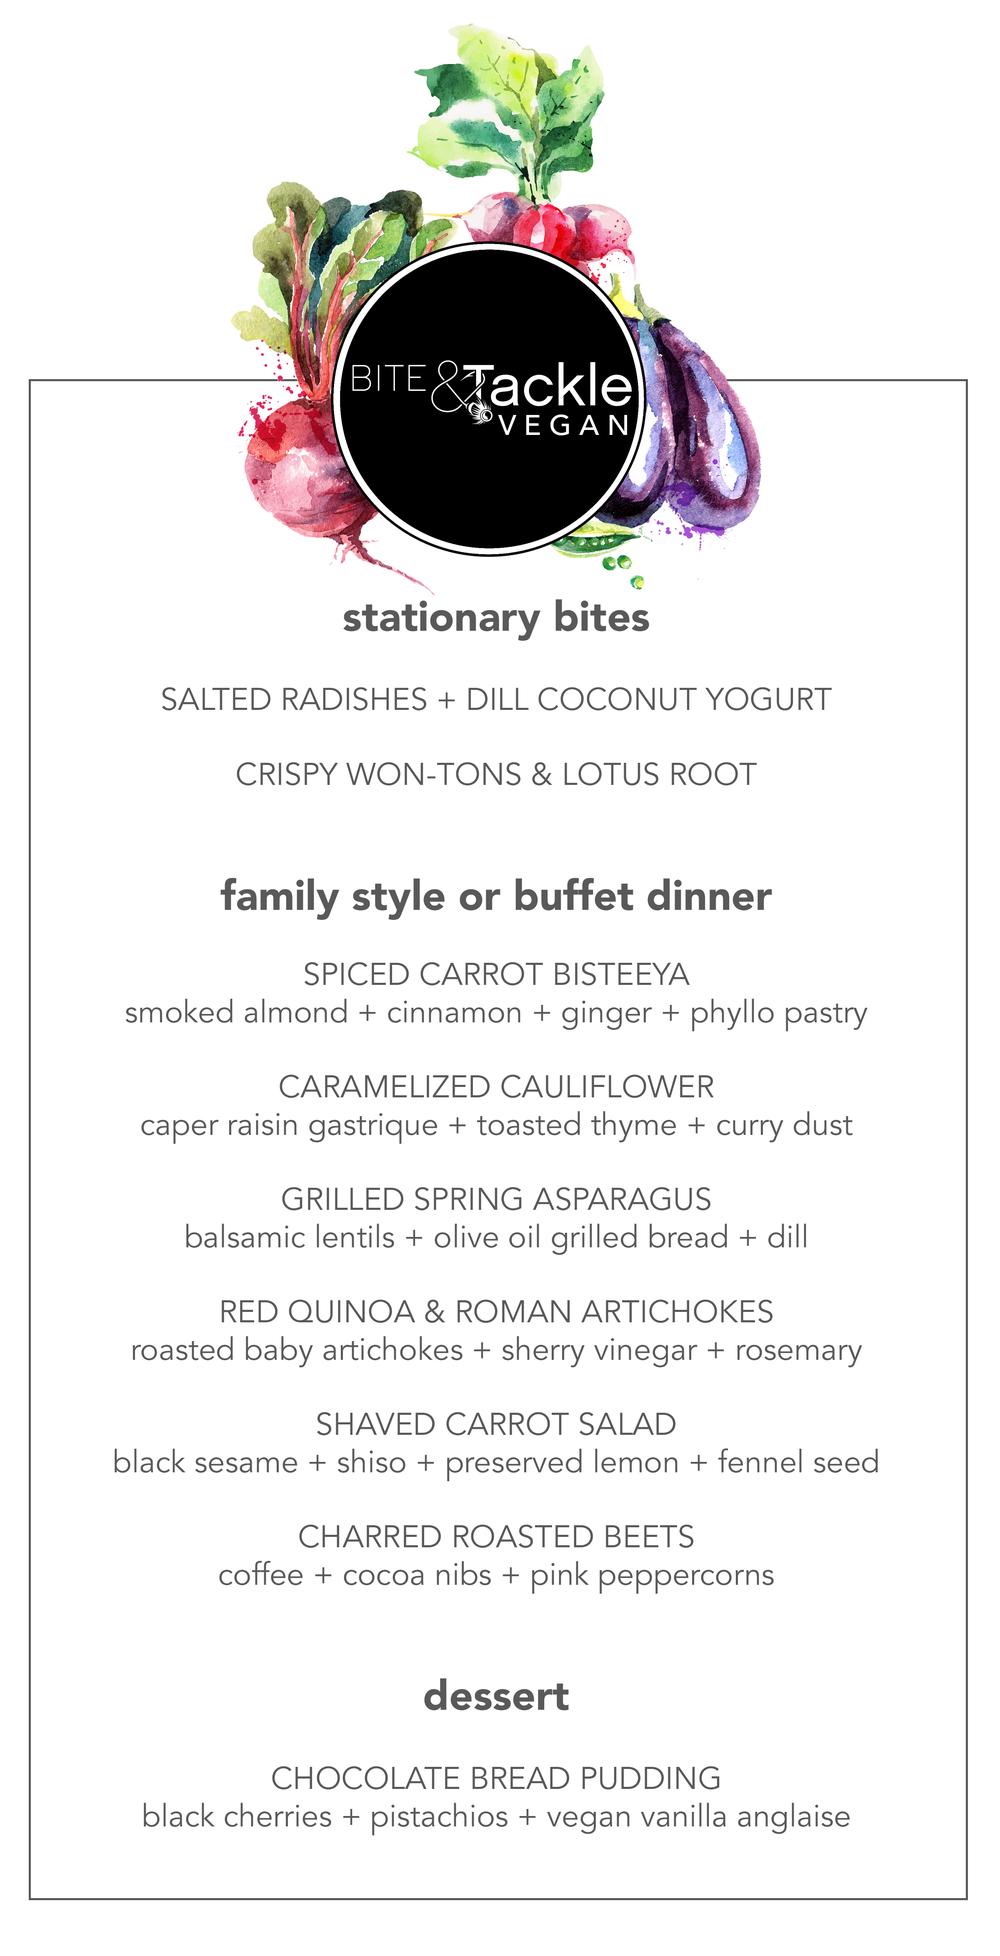 BITE & Tackle NYC Spring Vegan Dinner Menu